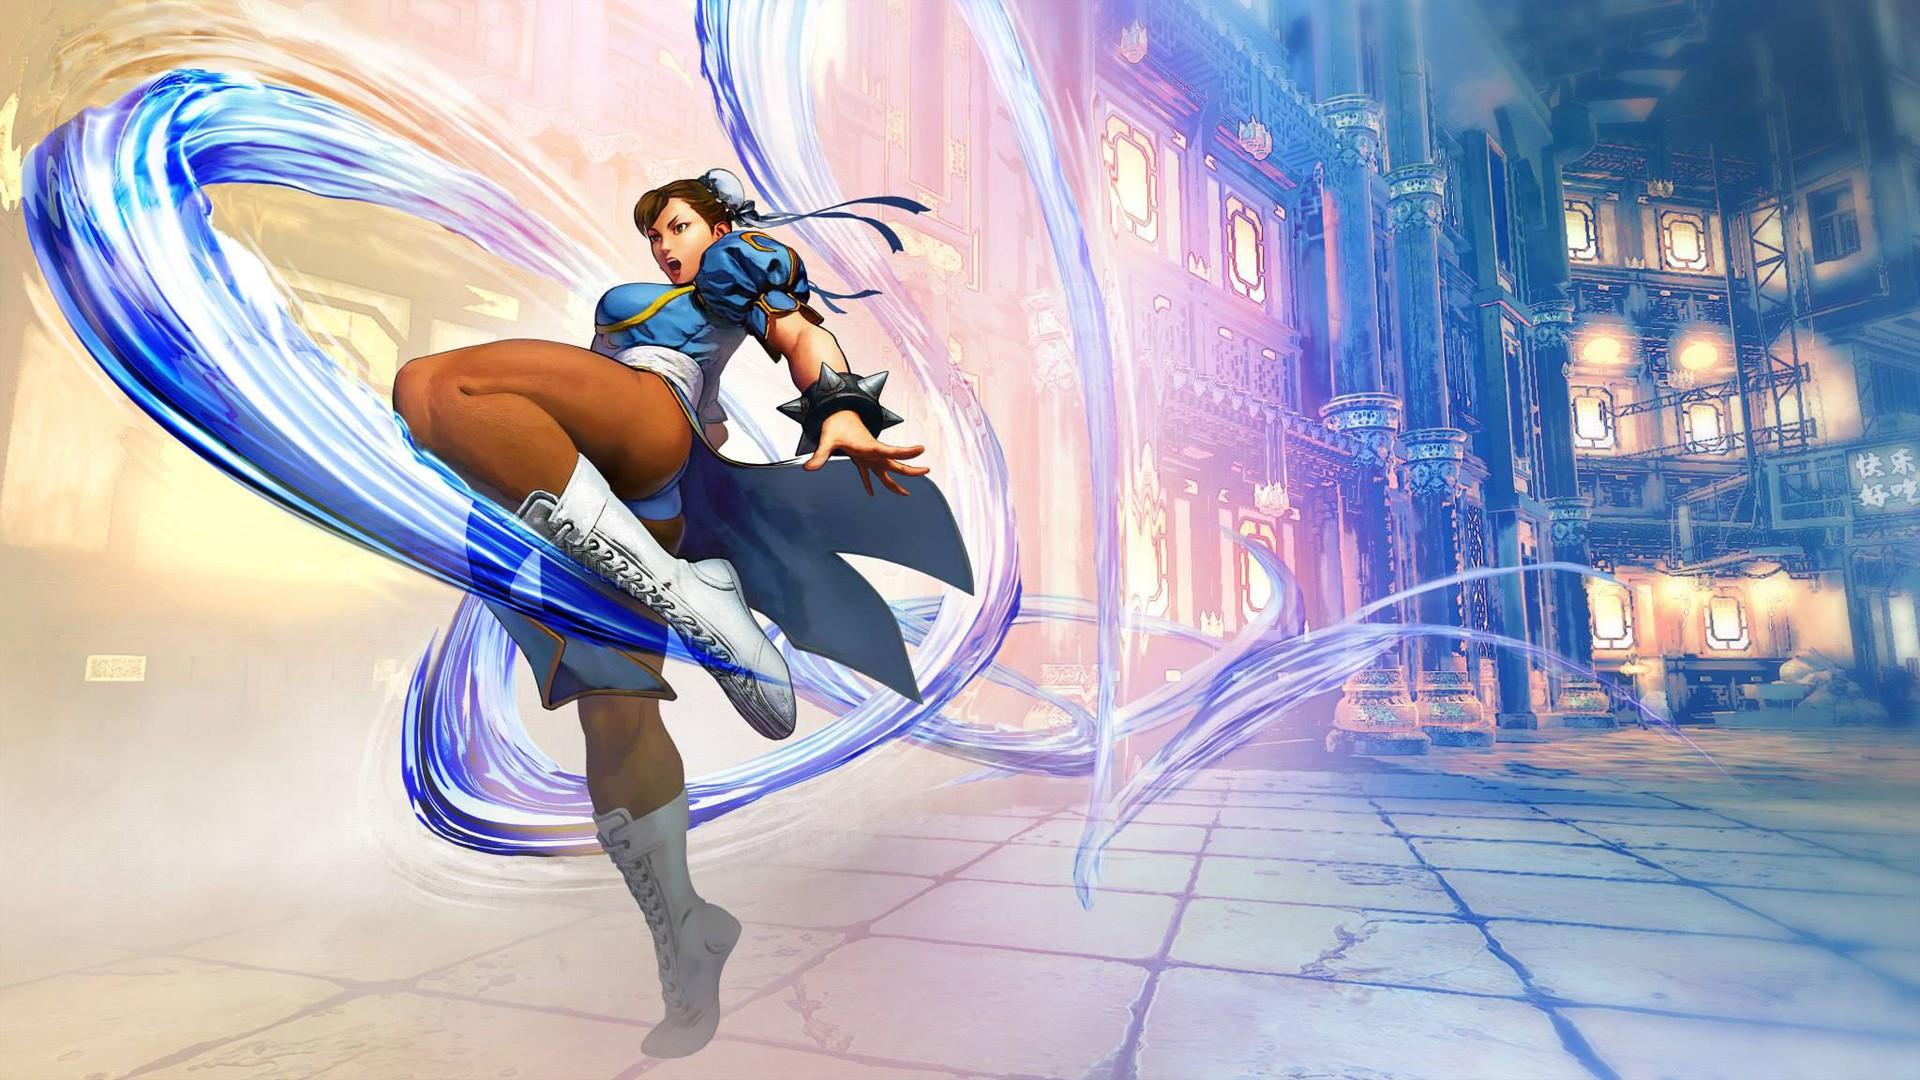 45+] Street Fighter Live Wallpaper on